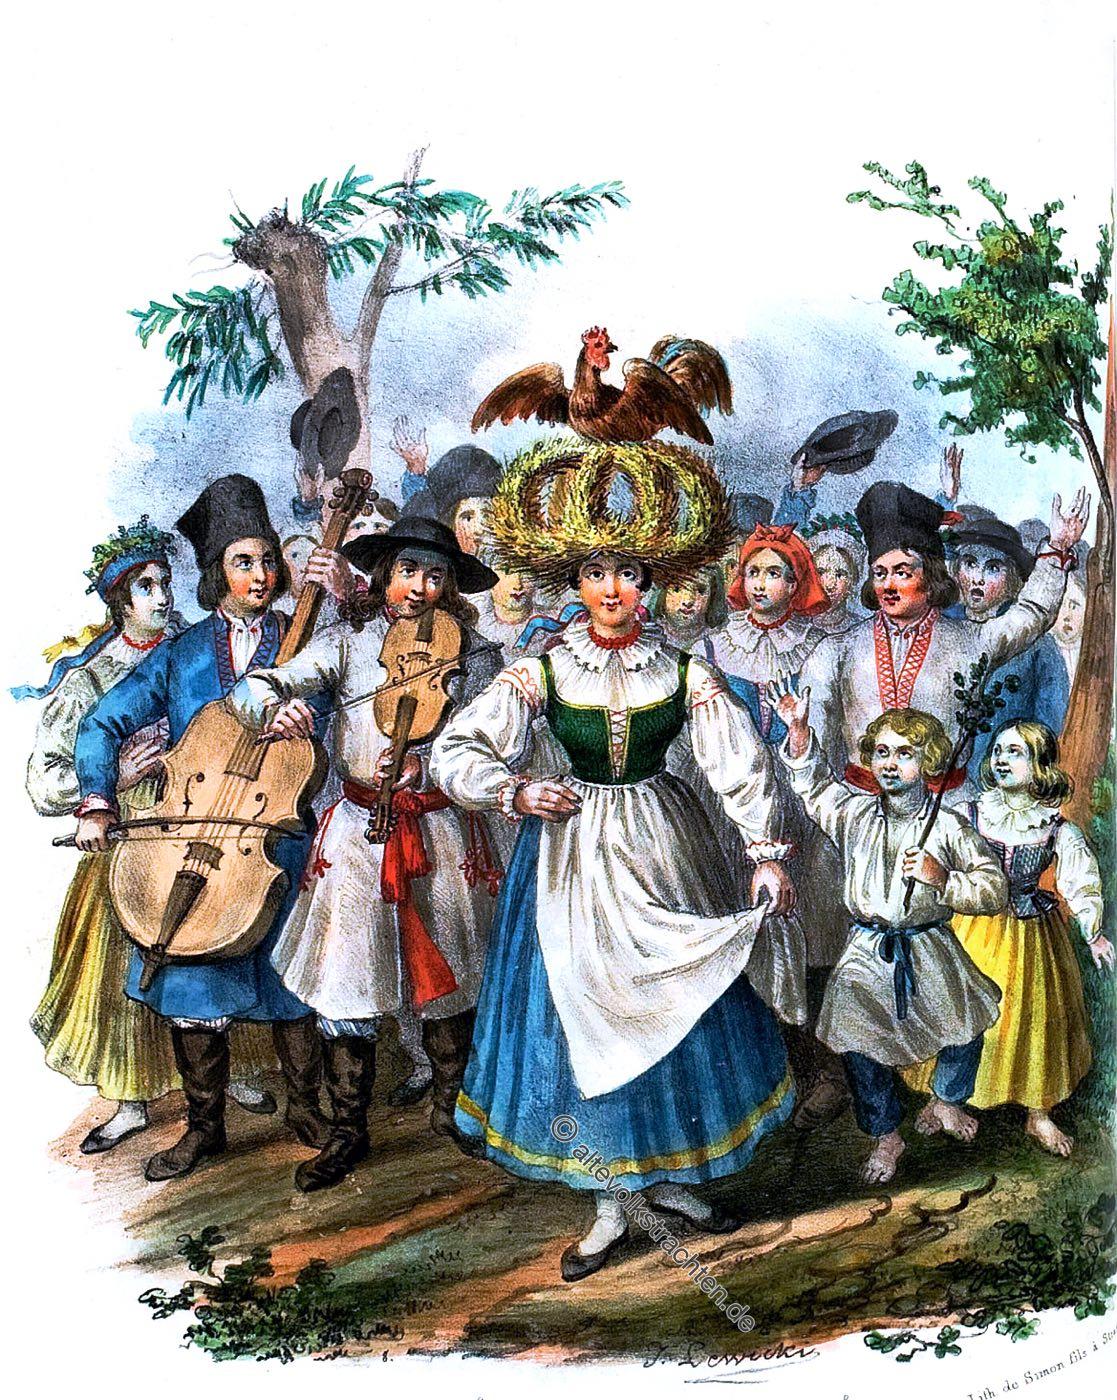 Trachten, Polen, Erntefest, Sandomierz, Kostüm, costume, Sandomir, Poland, Okrężne, Sandomirskiém